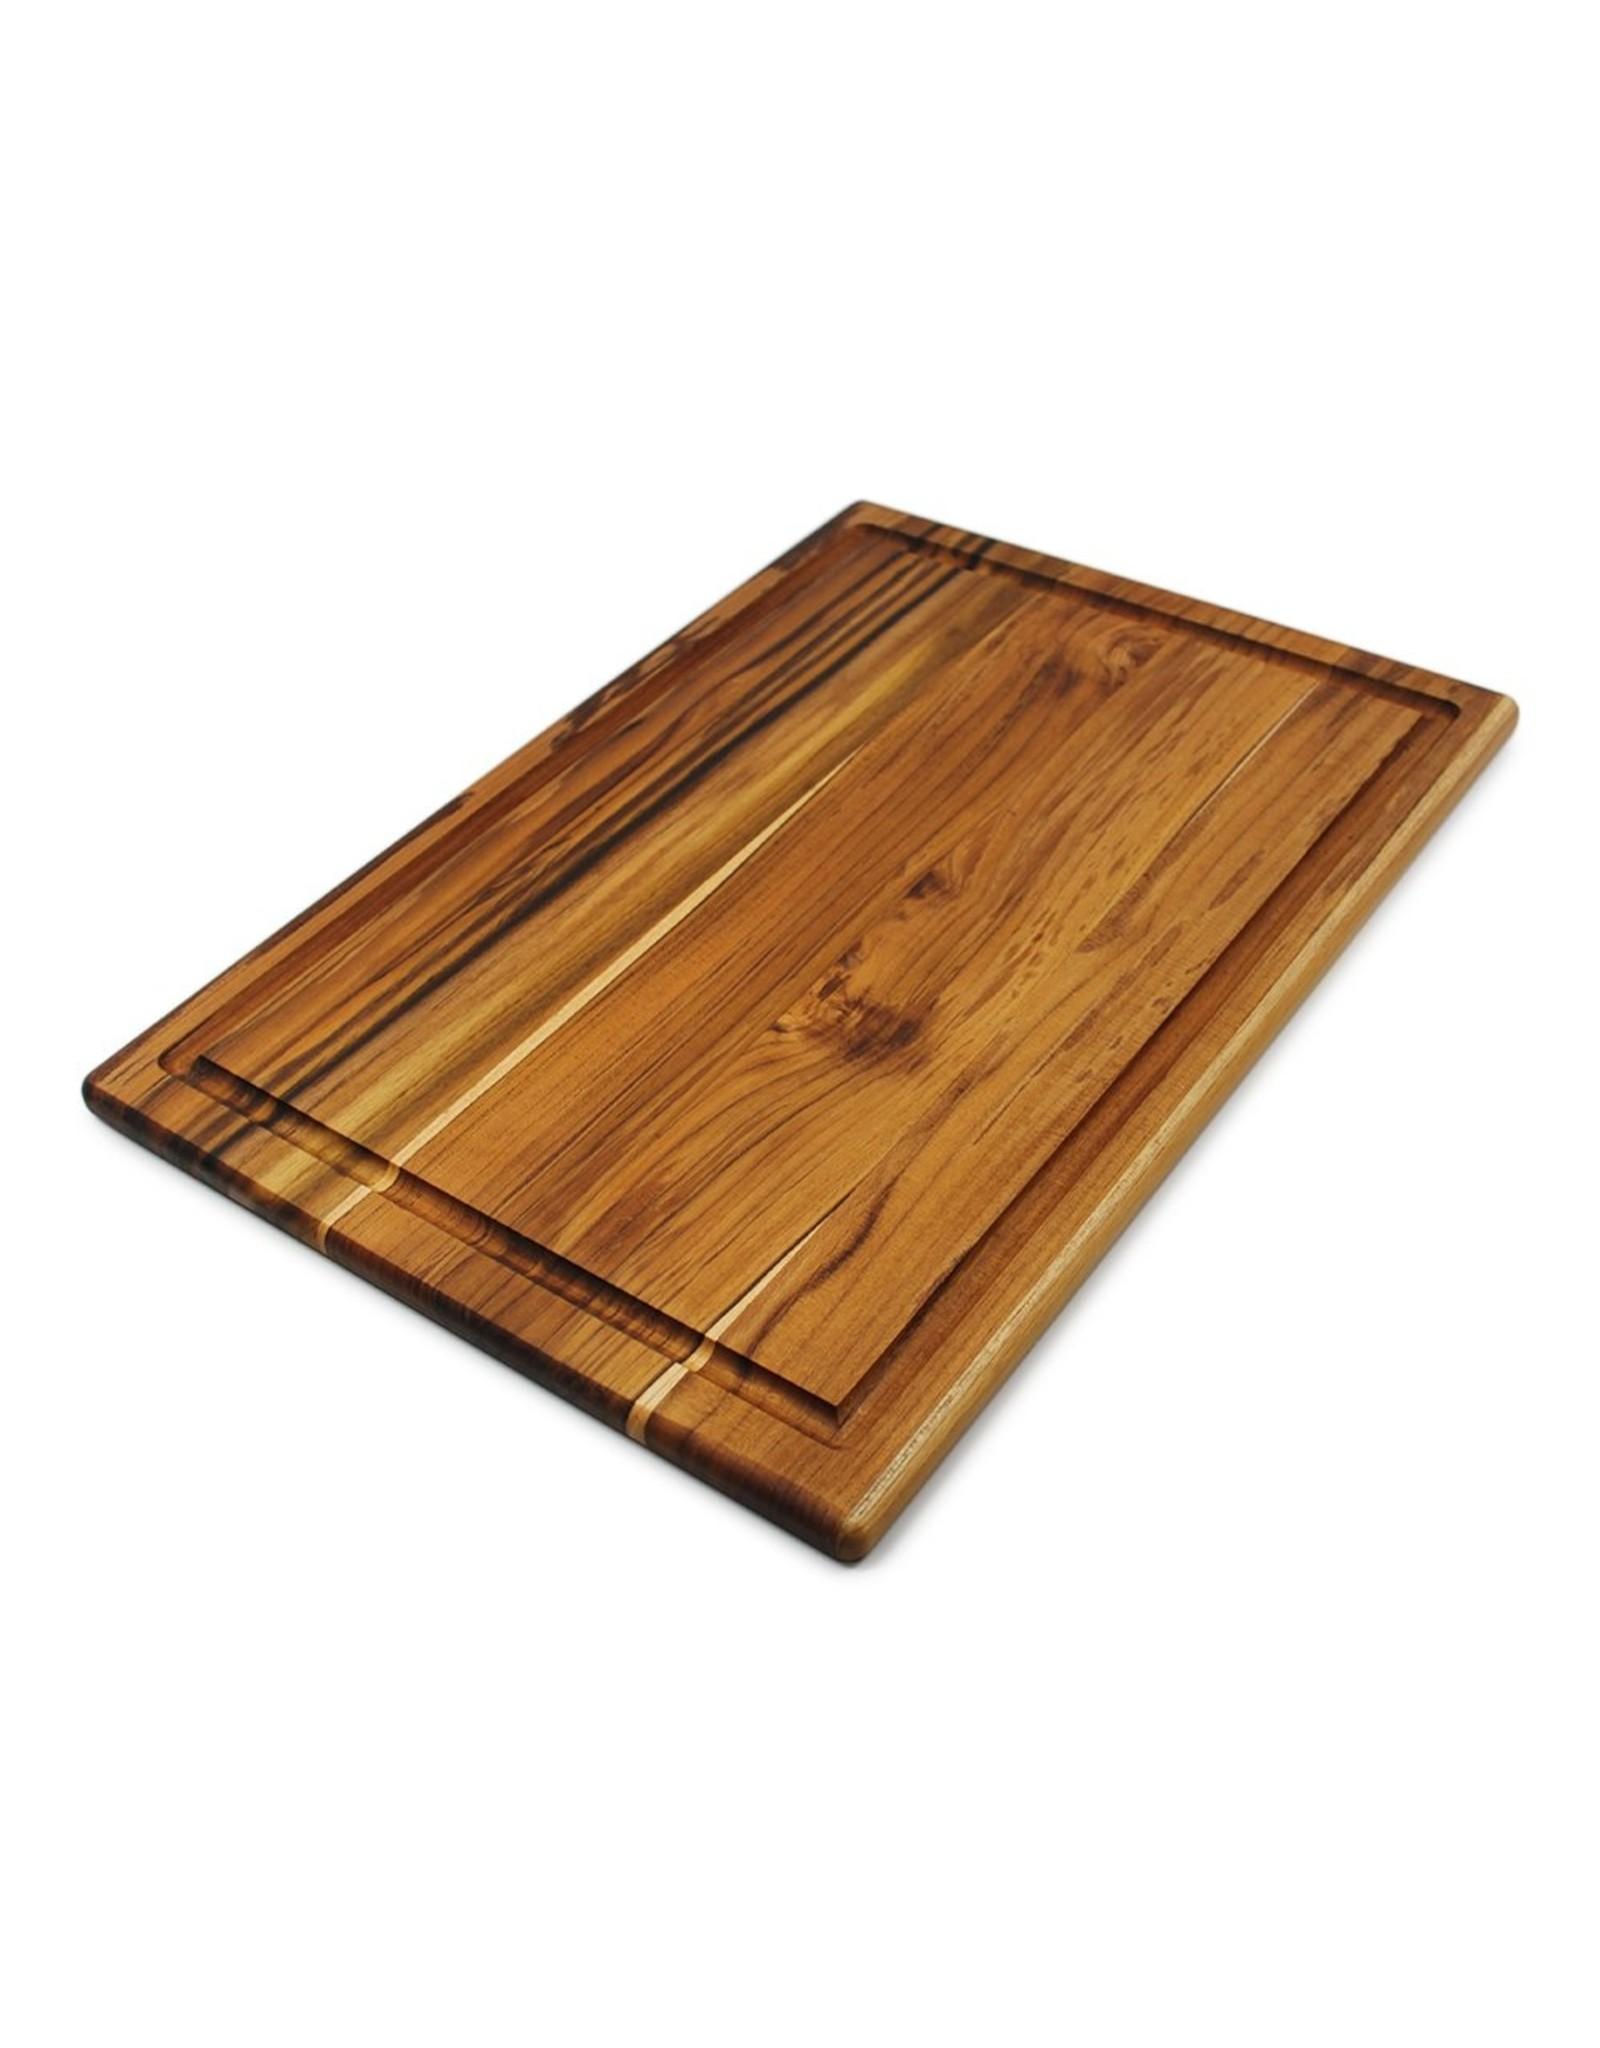 Teak - Edge Grain Carving Board XL